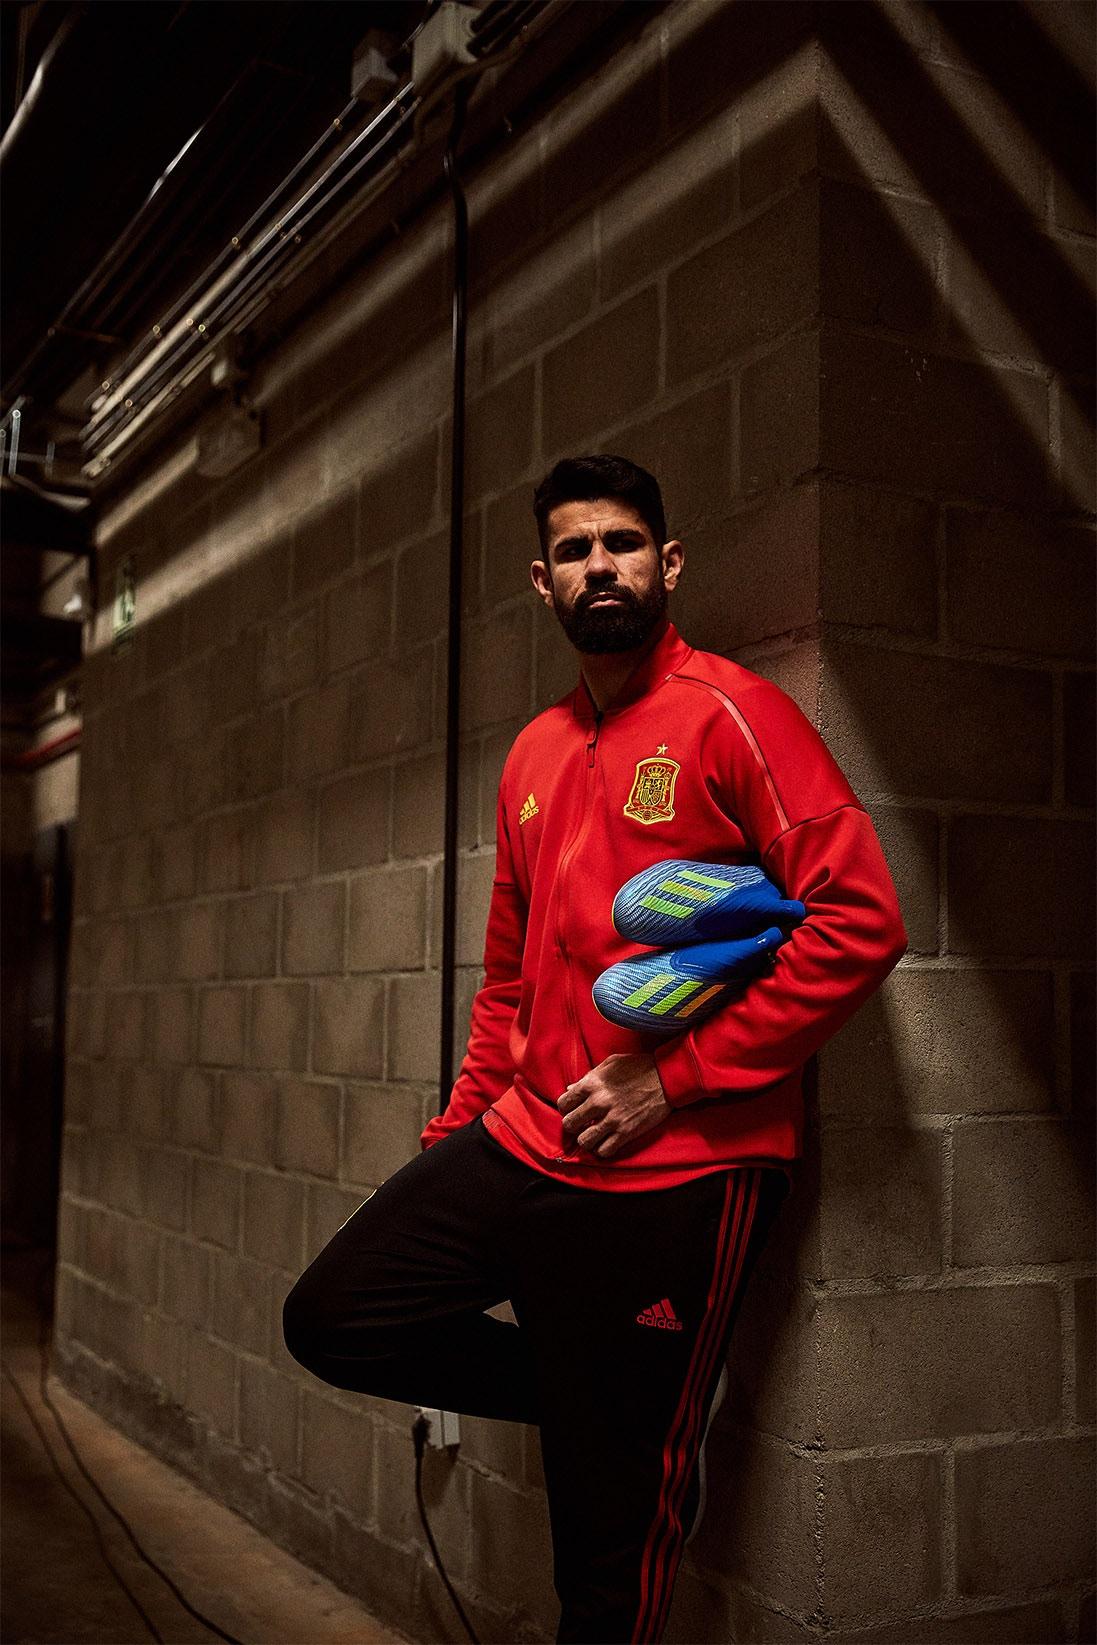 adidas-x18-energy-mode-football-boots-1